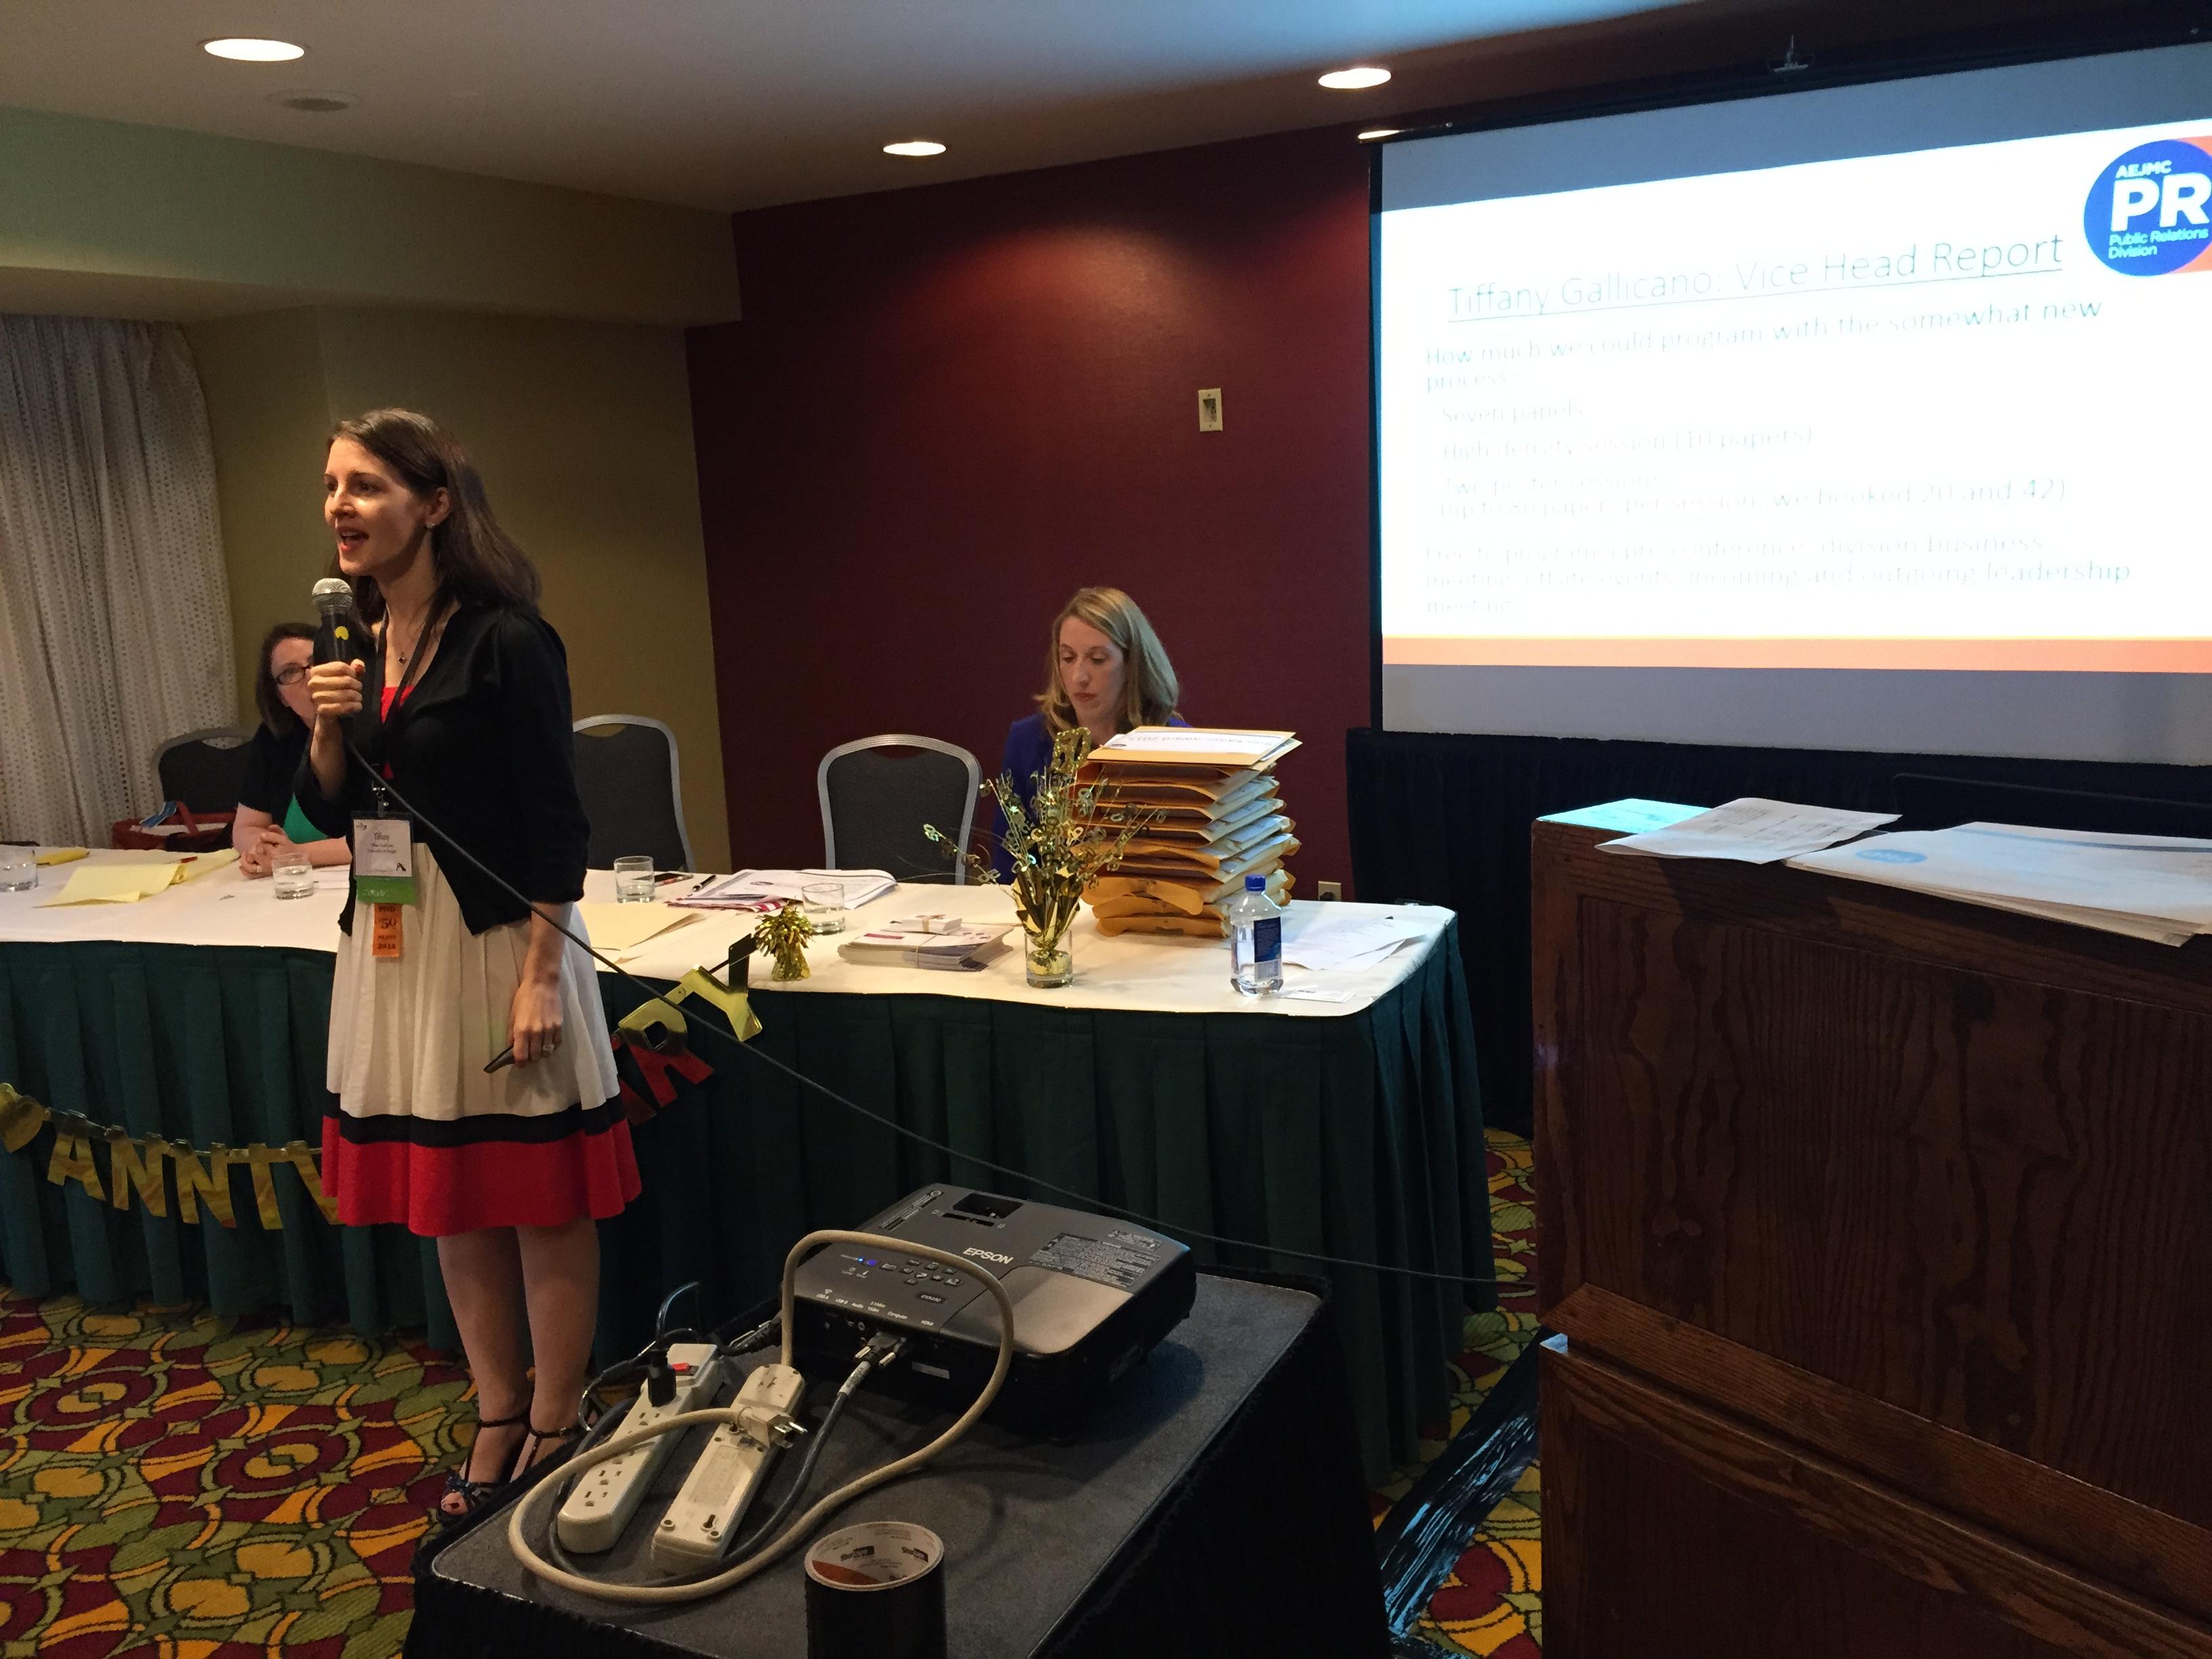 PRD Head Dr. Tiffany Gallicano addresses membership at the 2015 division meeting